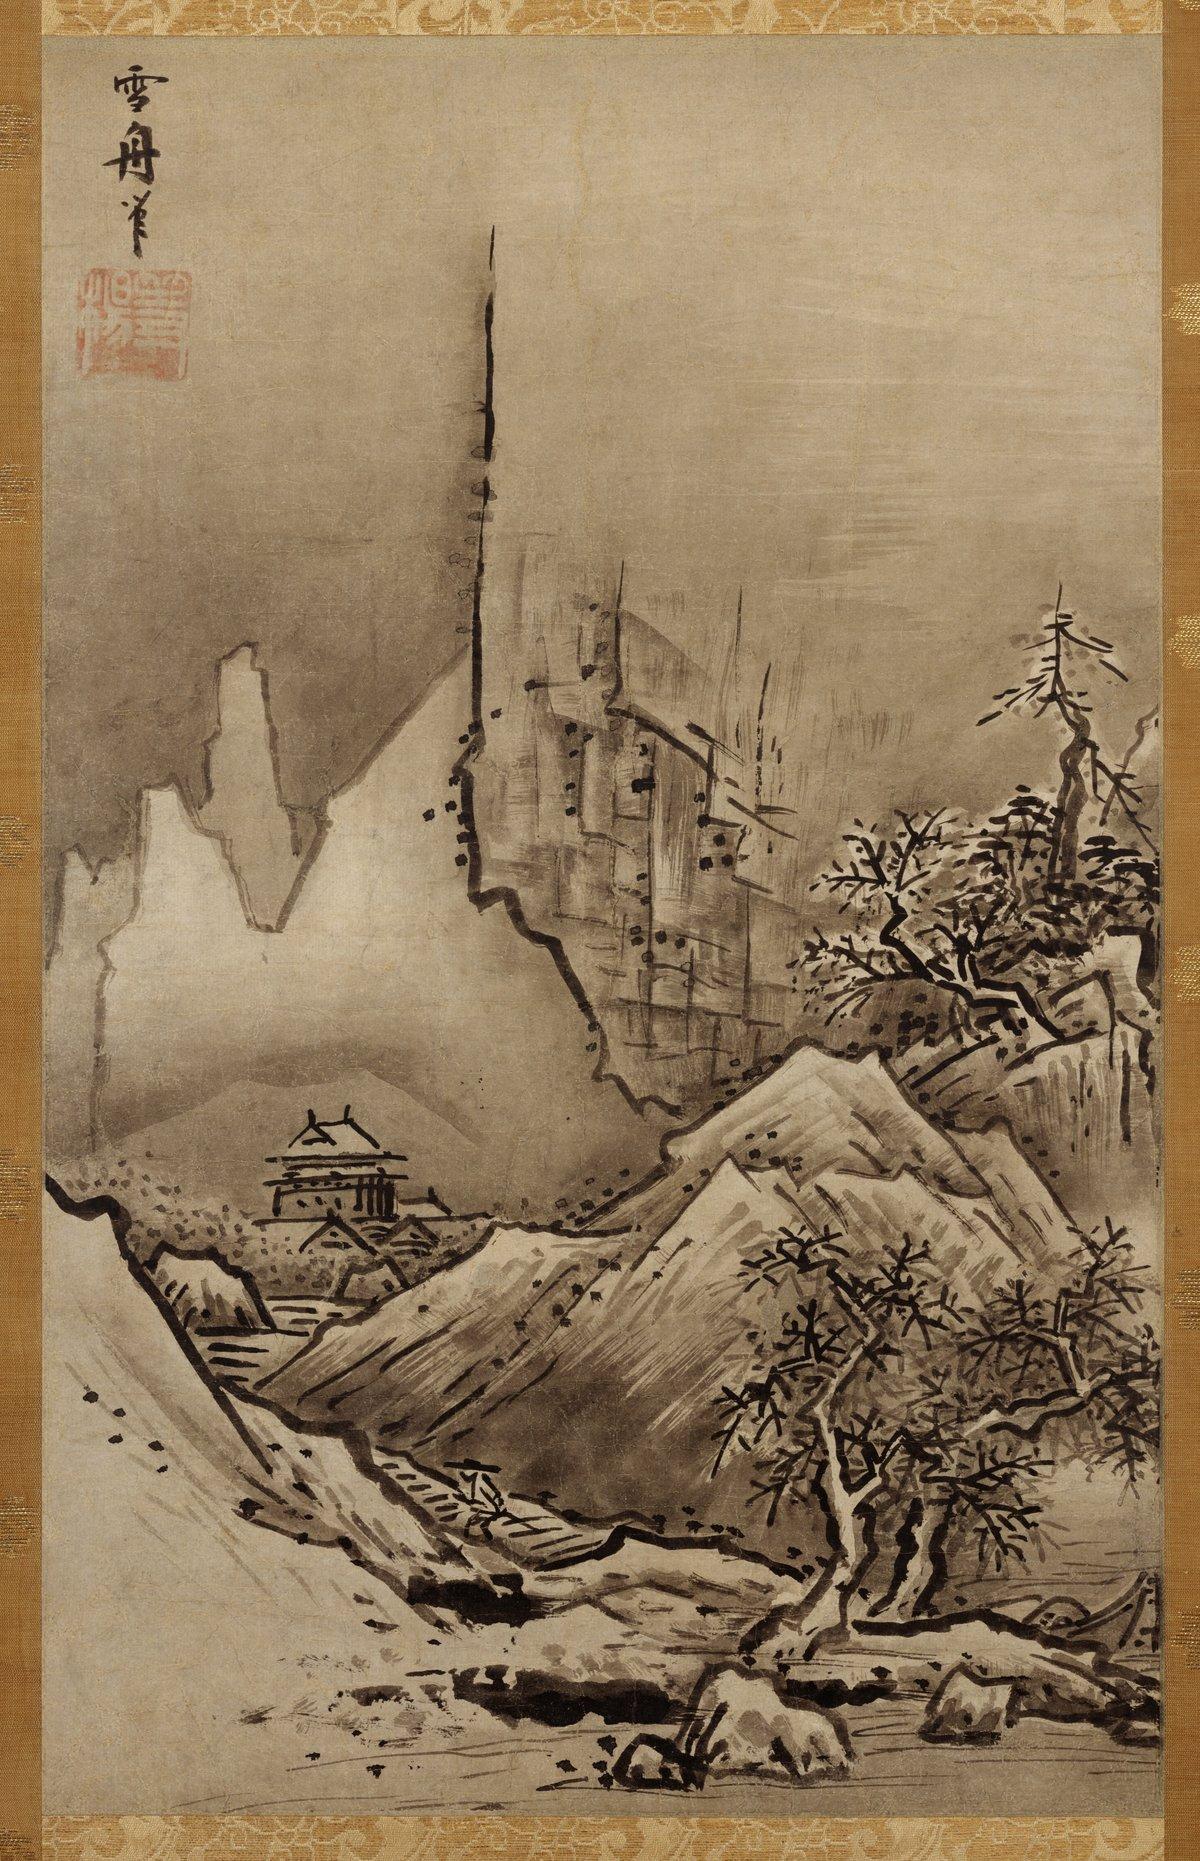 Японская живопись. Сэссю. «Зимний пейзаж»